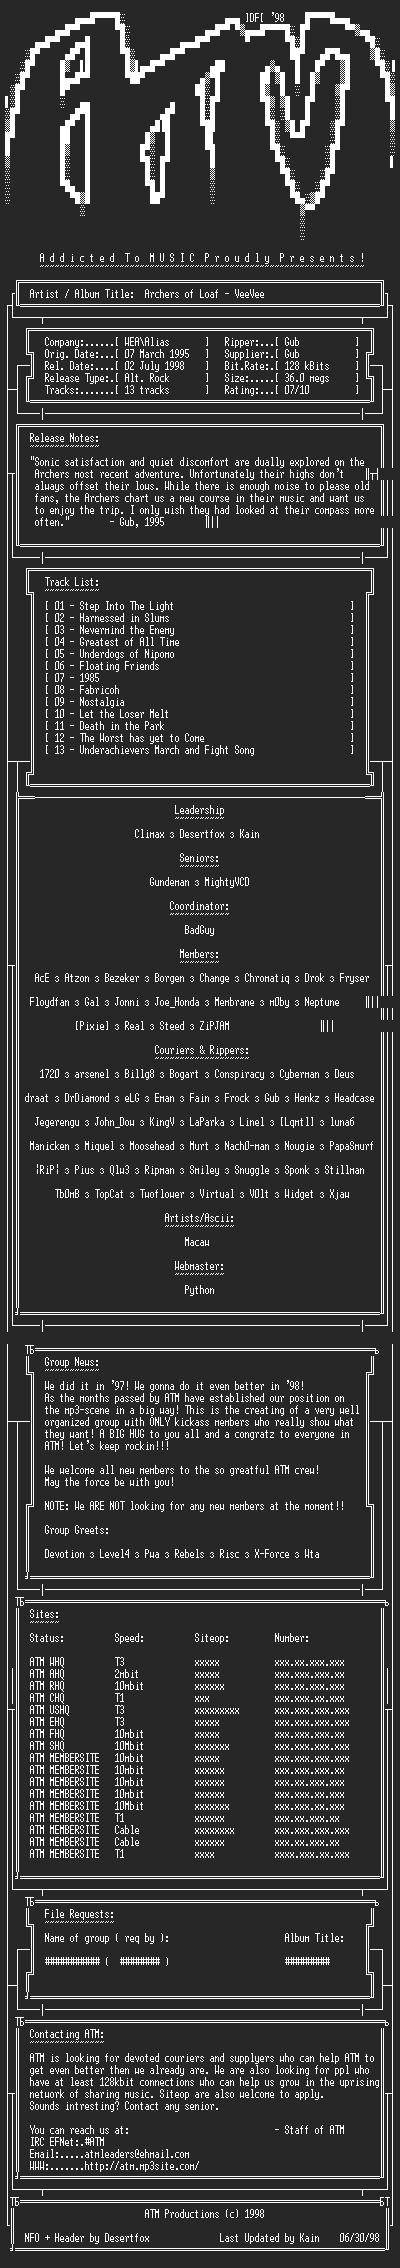 NFO file for Archers_of_Loaf_-_VeeVee_(1995)_-_ATM